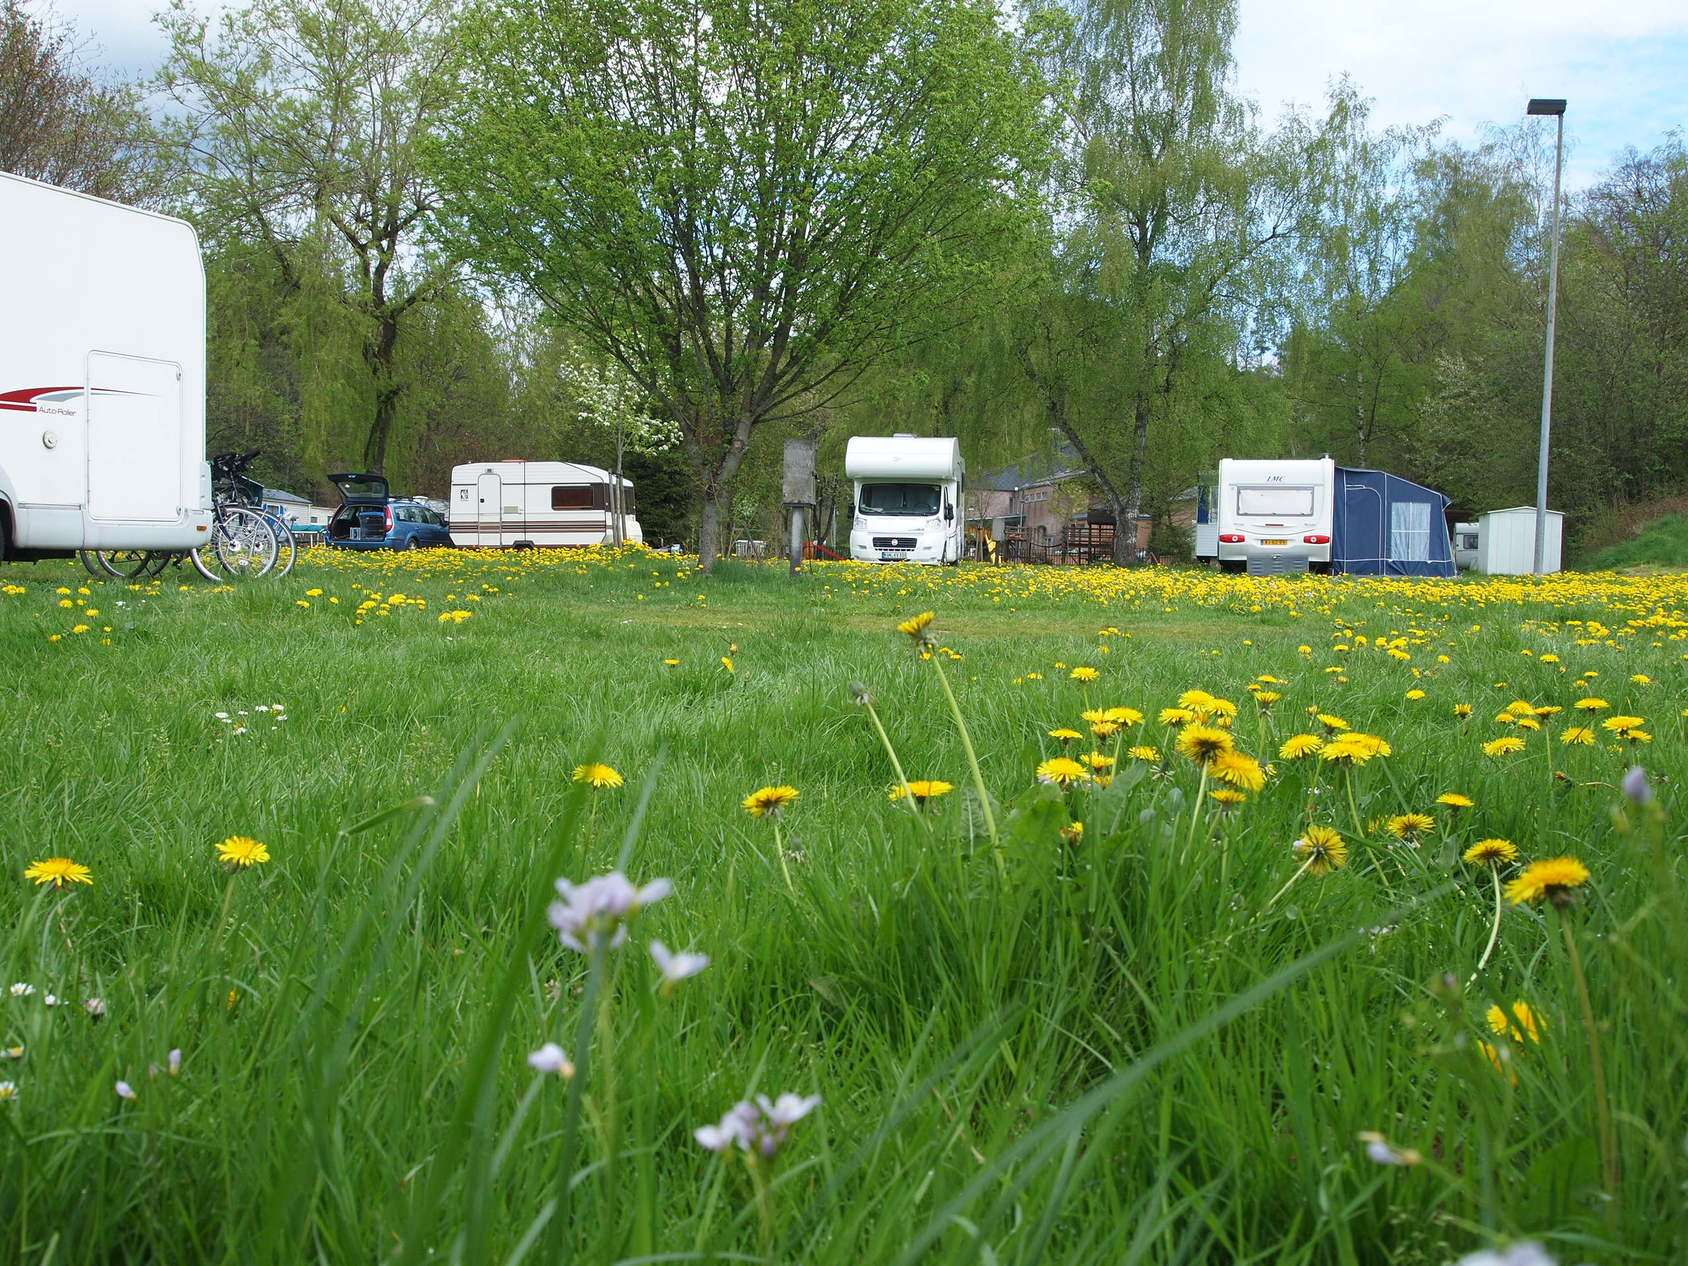 Belgie-Stavelot-Camping%20lEau%20Rouge-ExtraLarge Campings België